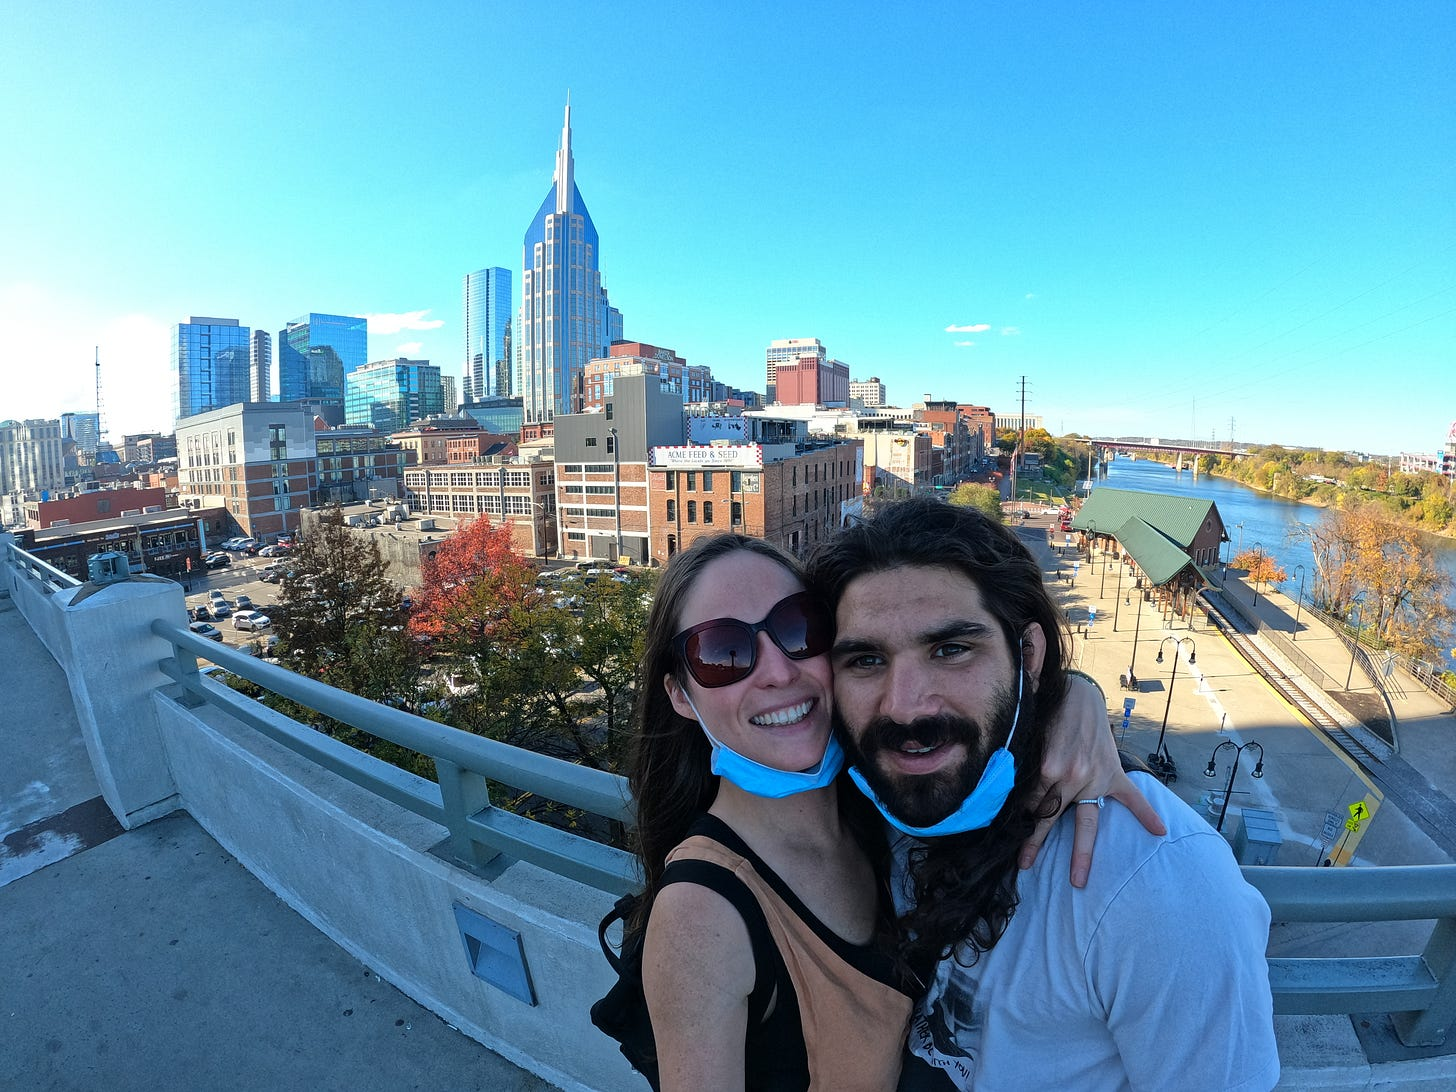 Anthony & Kelly selfie on the walking bridge overlooking the Cumberland River & Nashville, TN